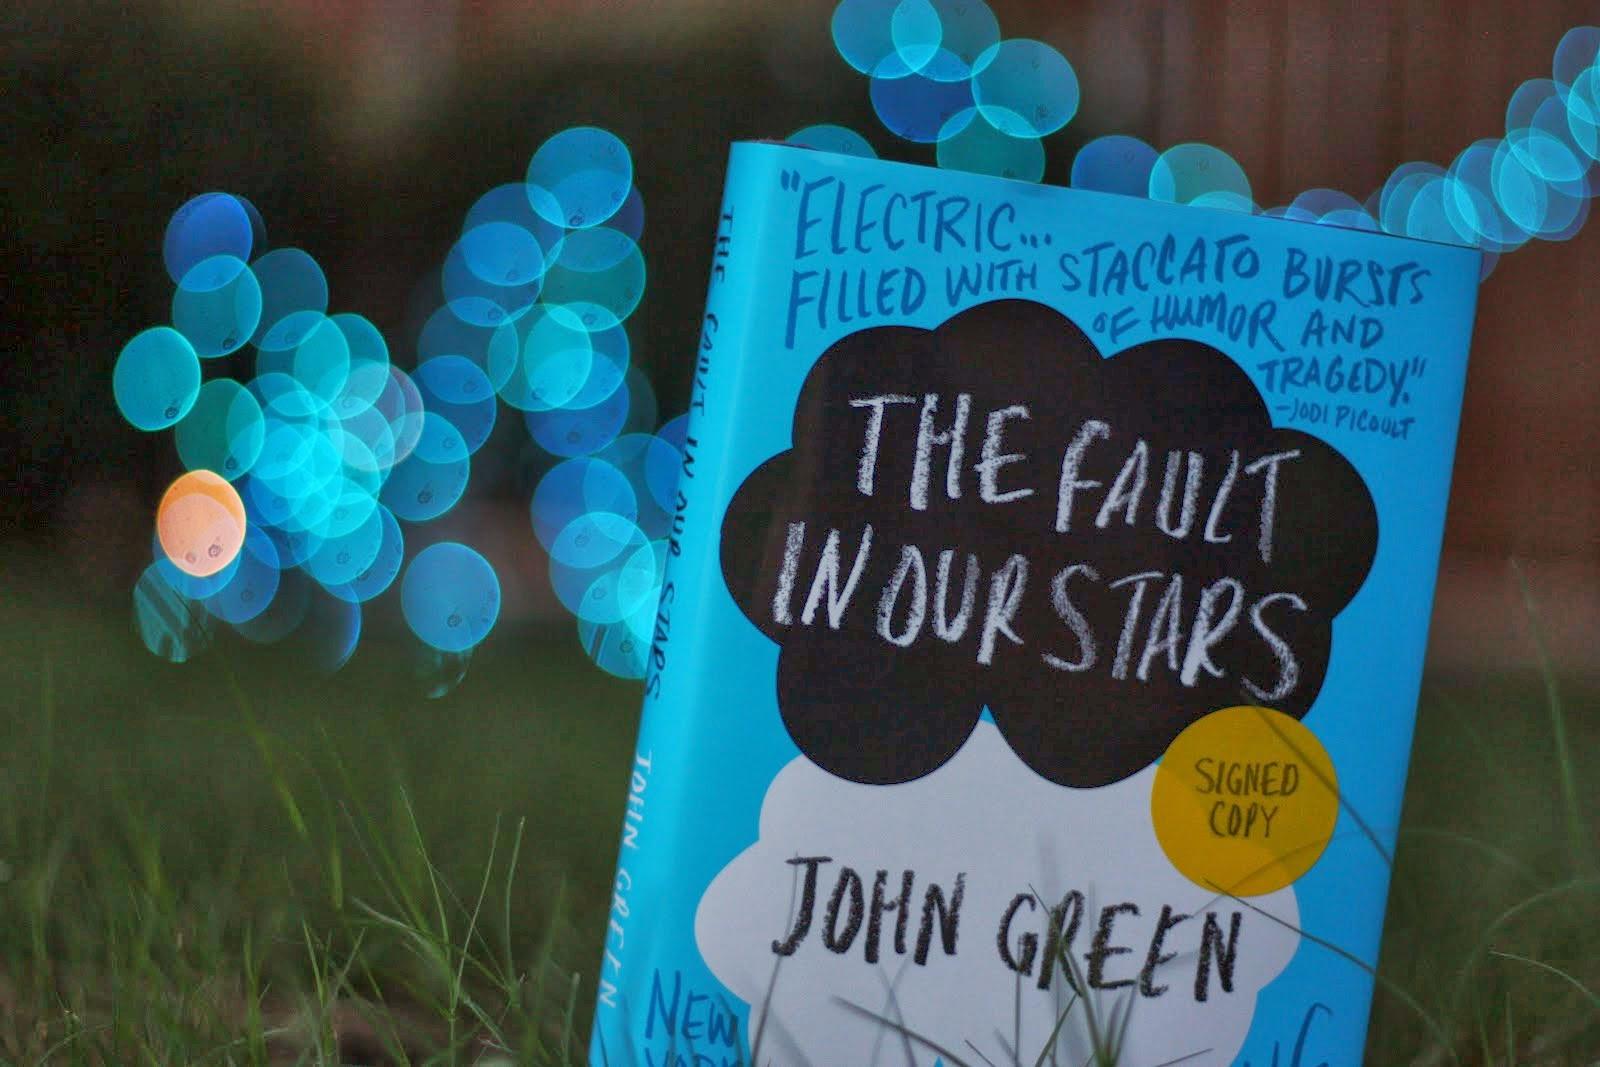 The Fault In Our Stars The Fault In Our Stars Wallpaper